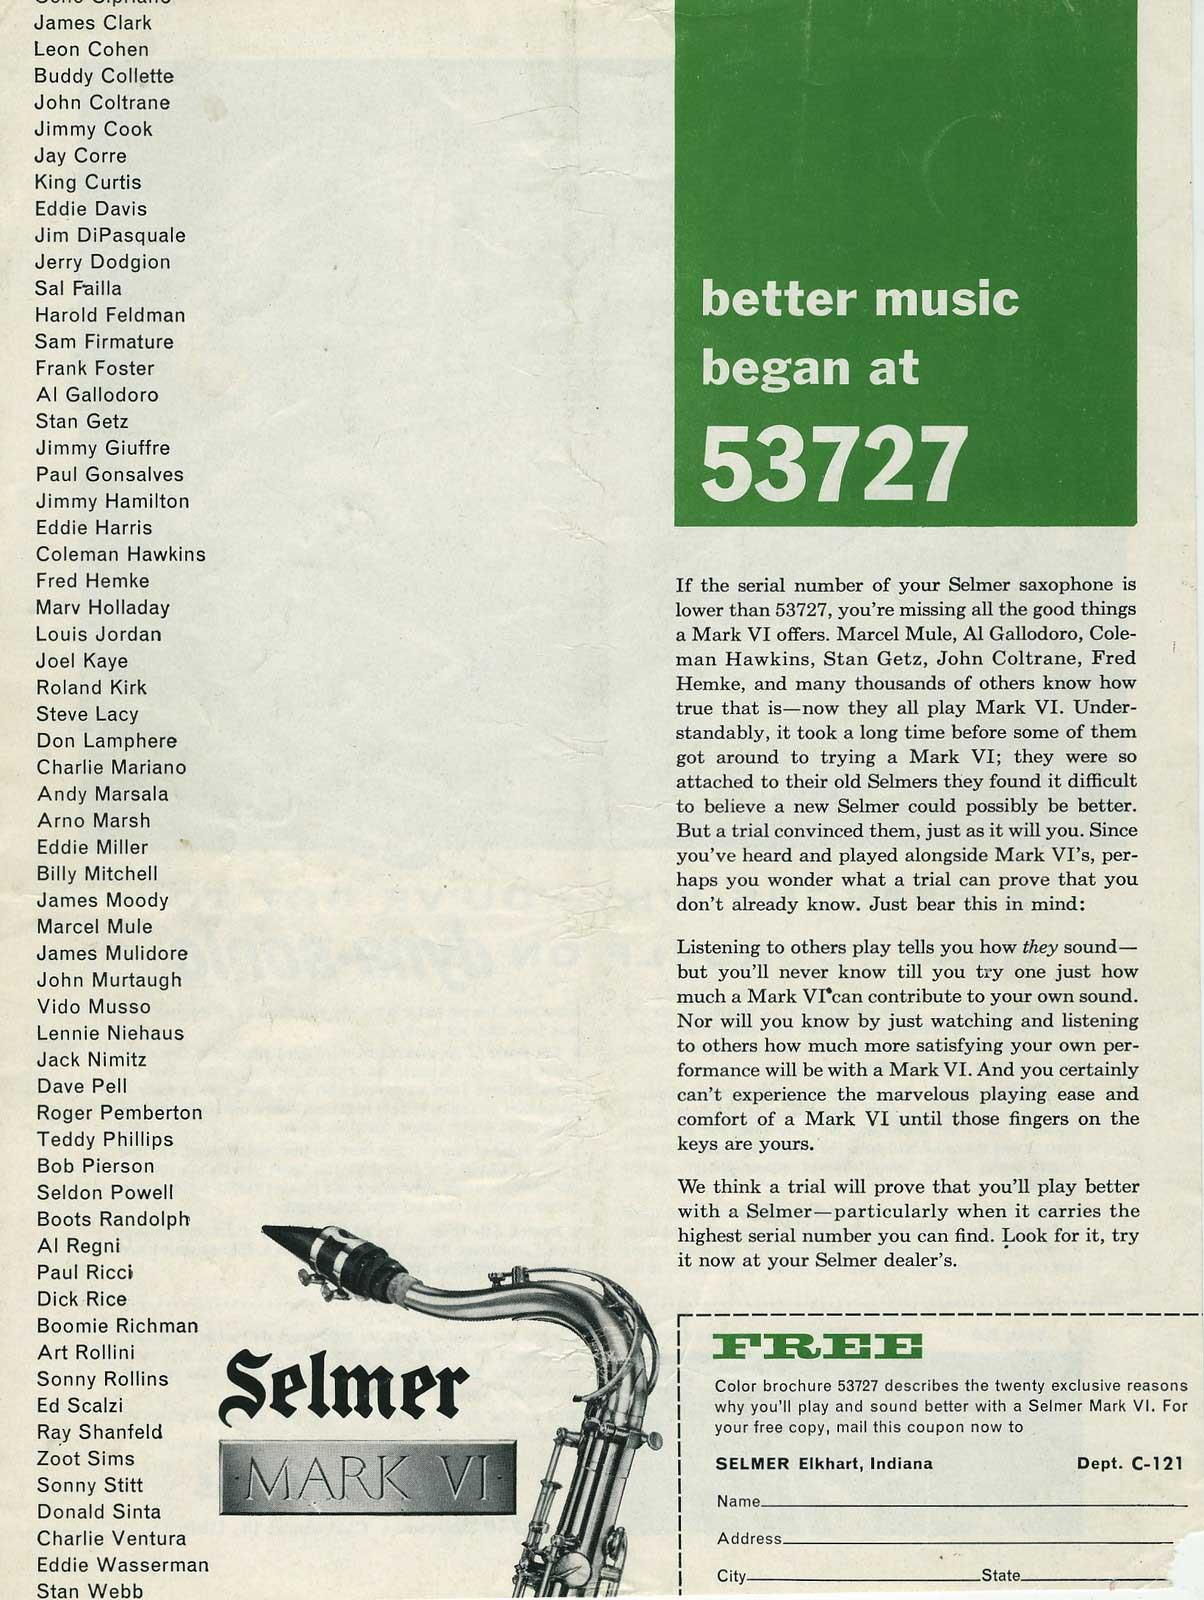 Selmer Mark VIs Began At # 53727 | The Bassic Sax Blog